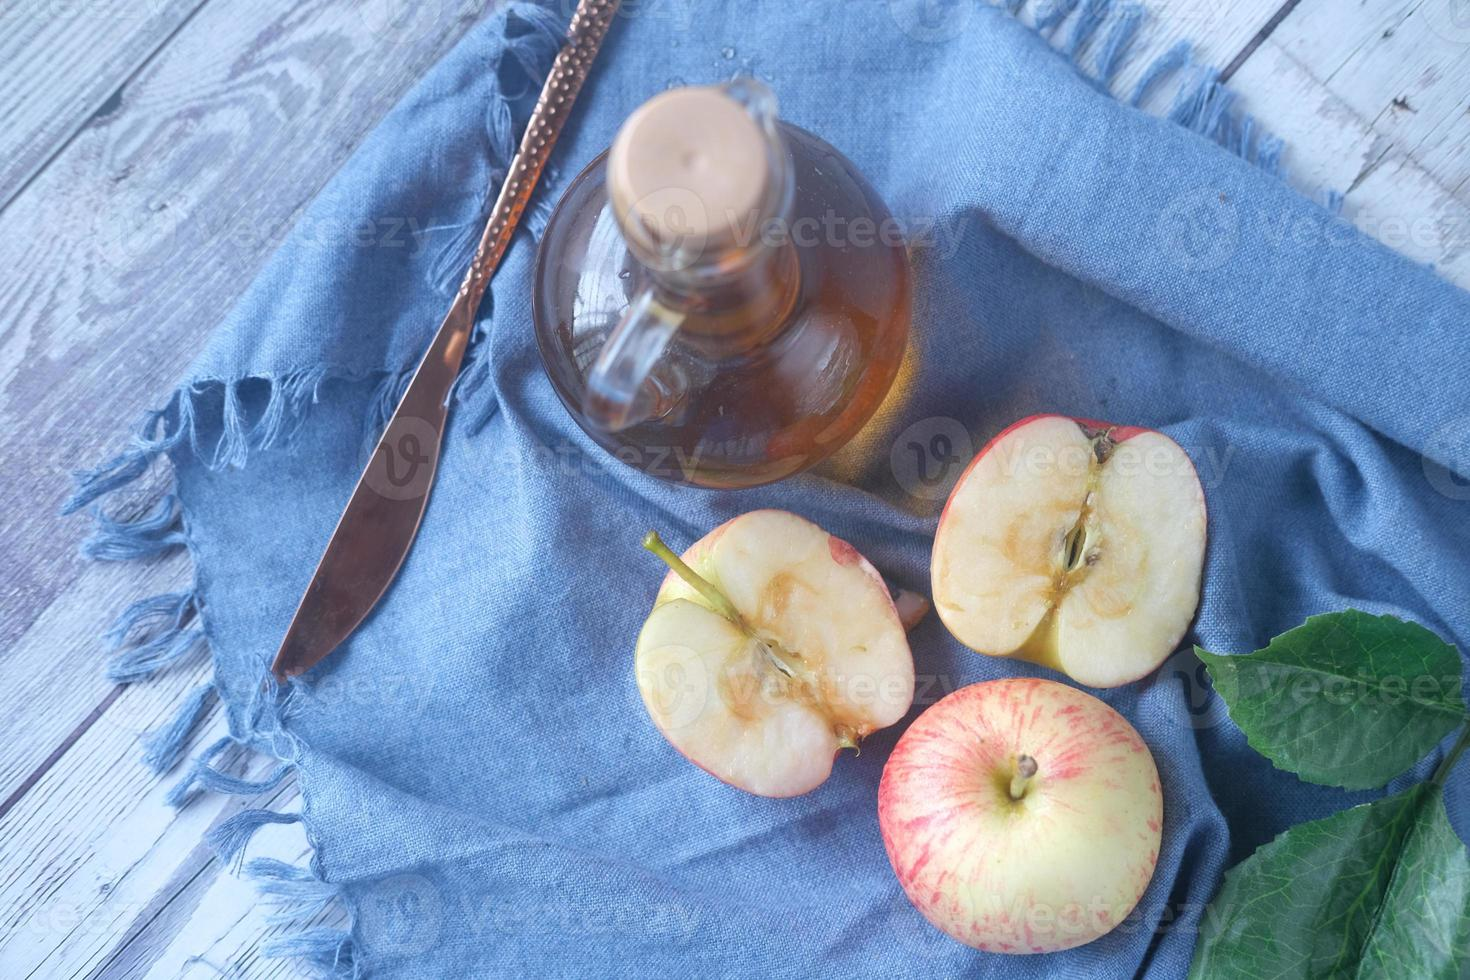 apple vinegar in glass bottle with fresh green apple on table photo